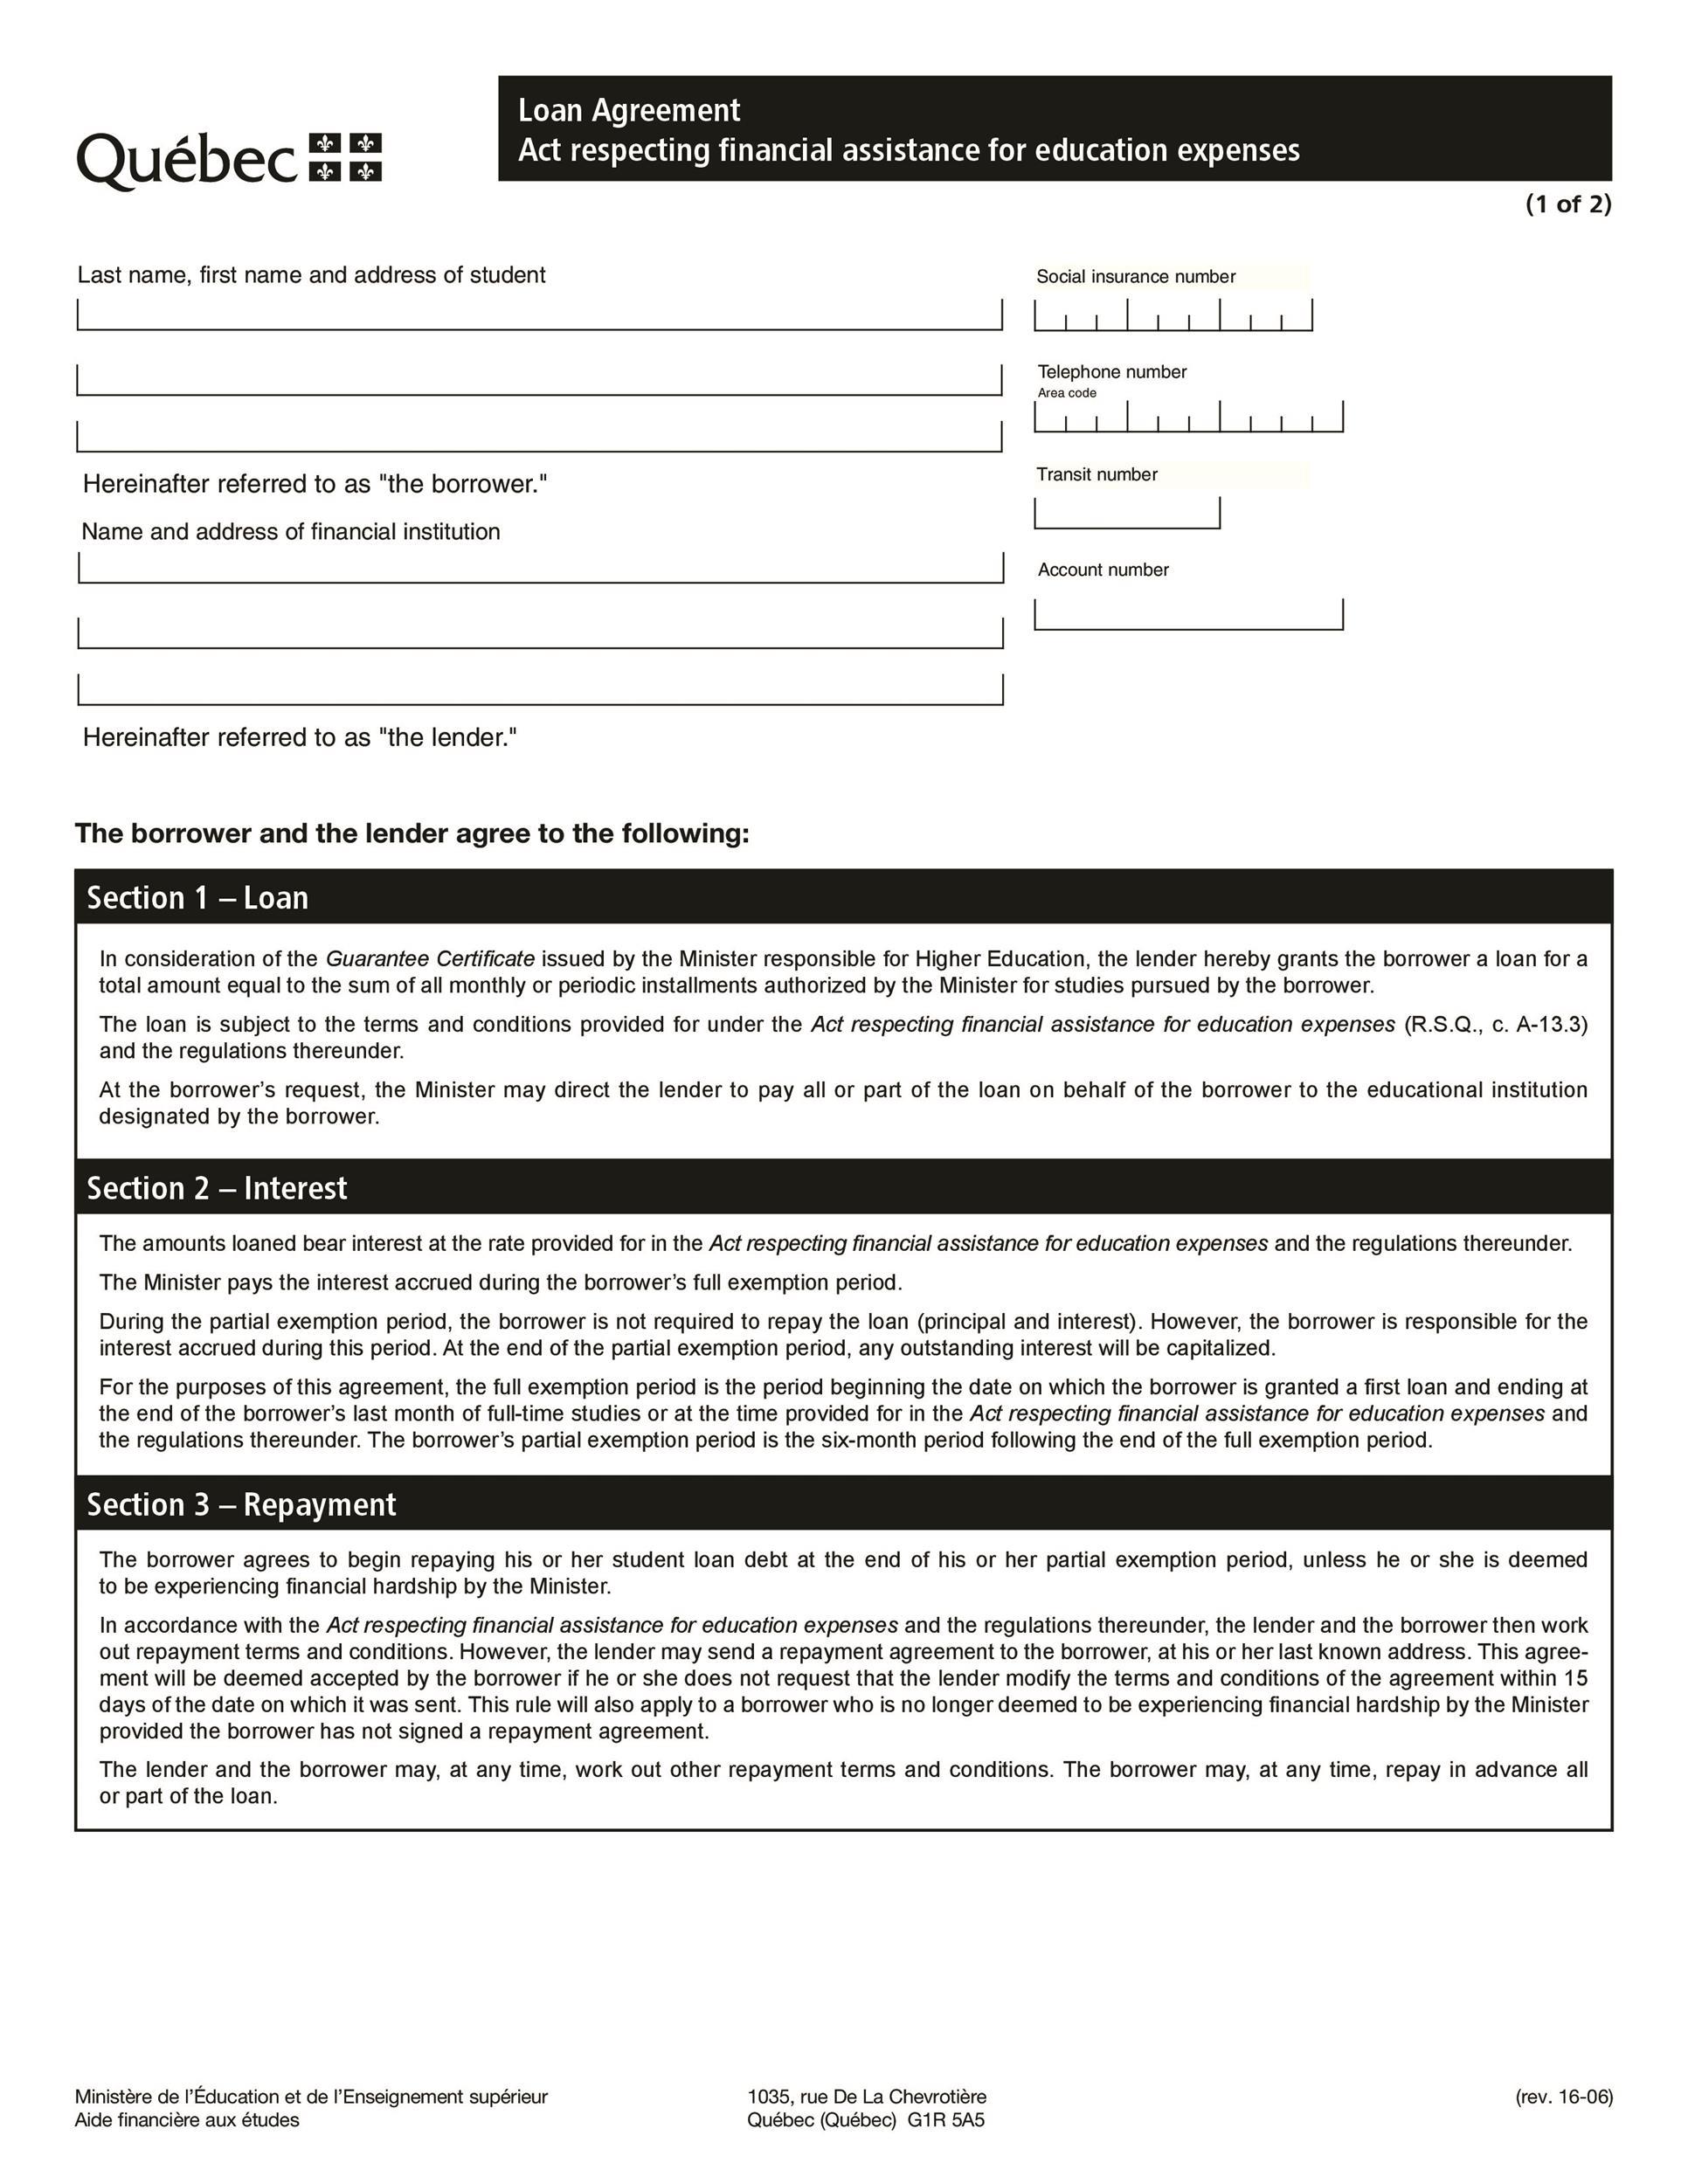 Free loan agreement template 42